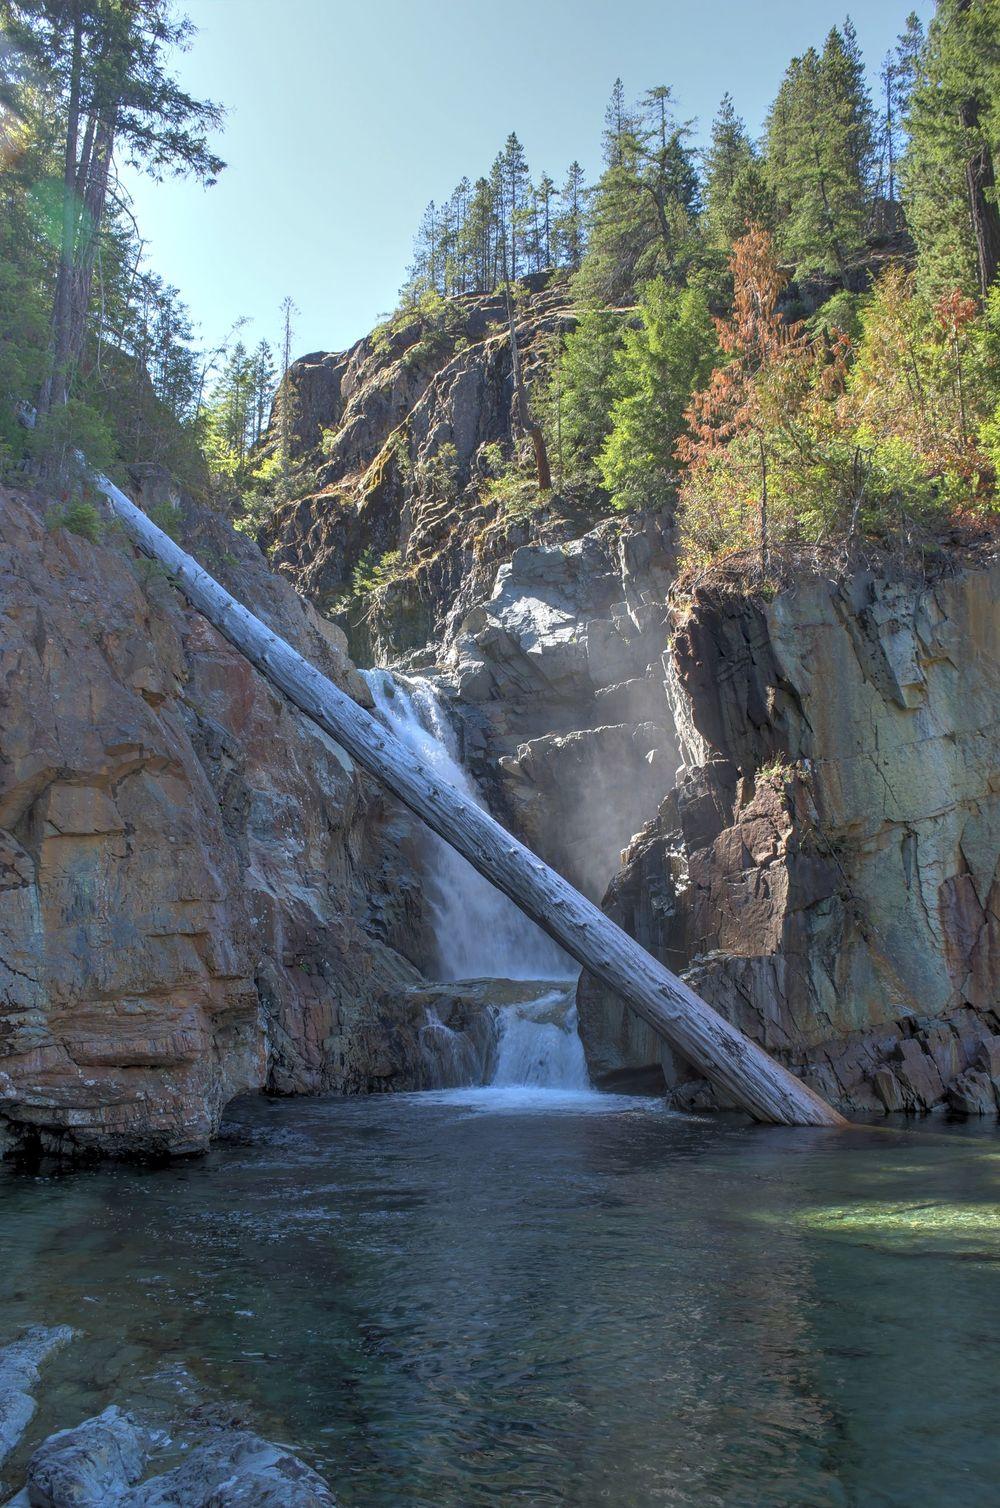 Myra Falls, Strathcona Provincial Park, BC, CA